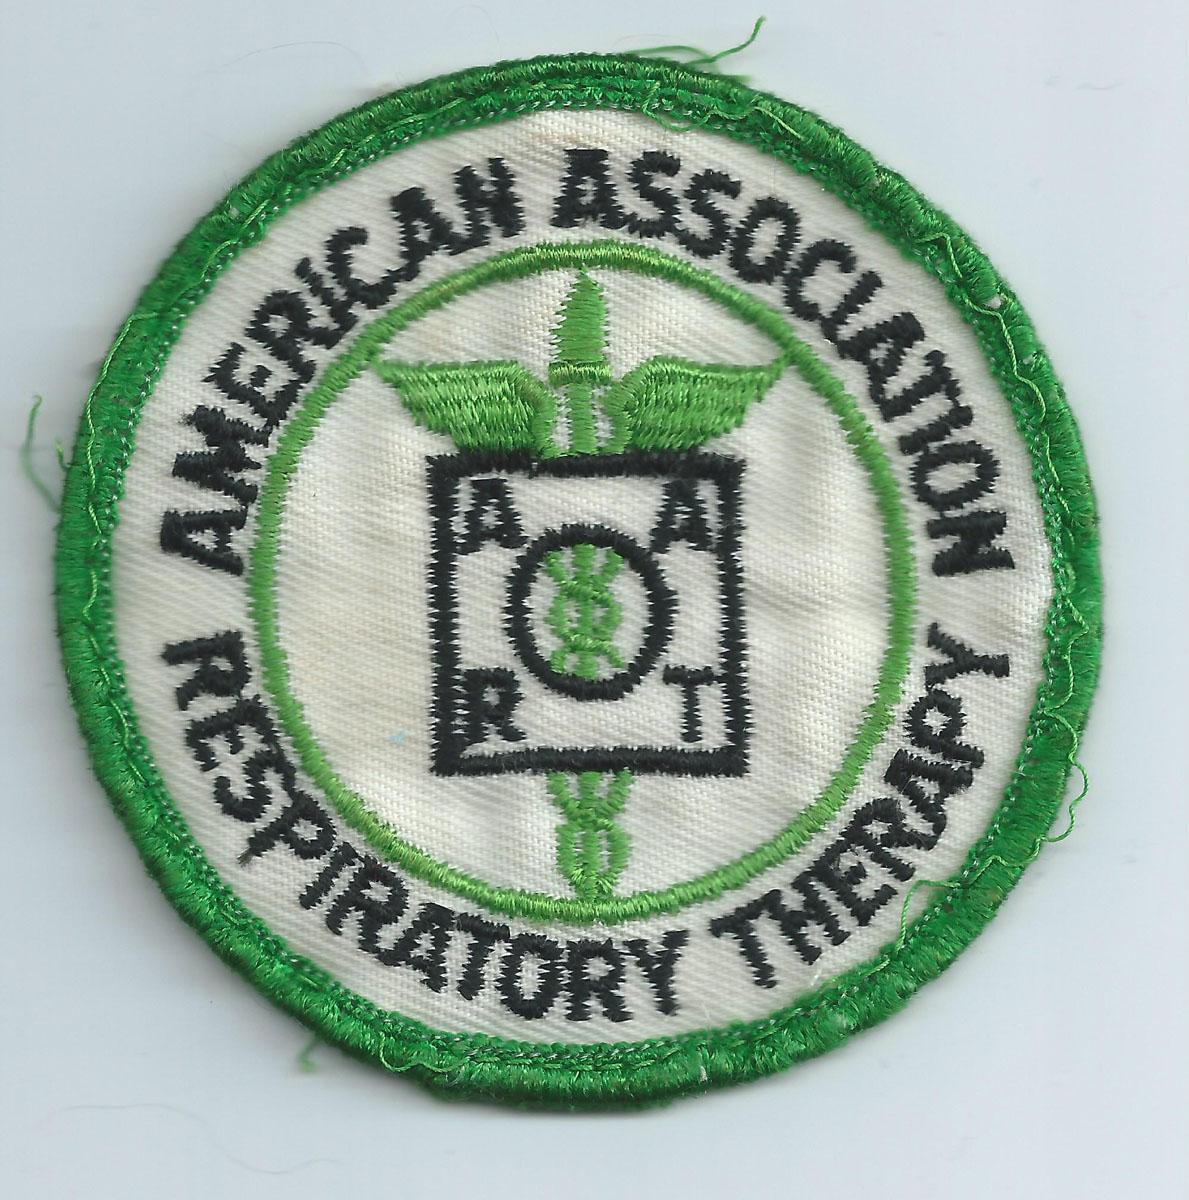 1973 Profession Renamed